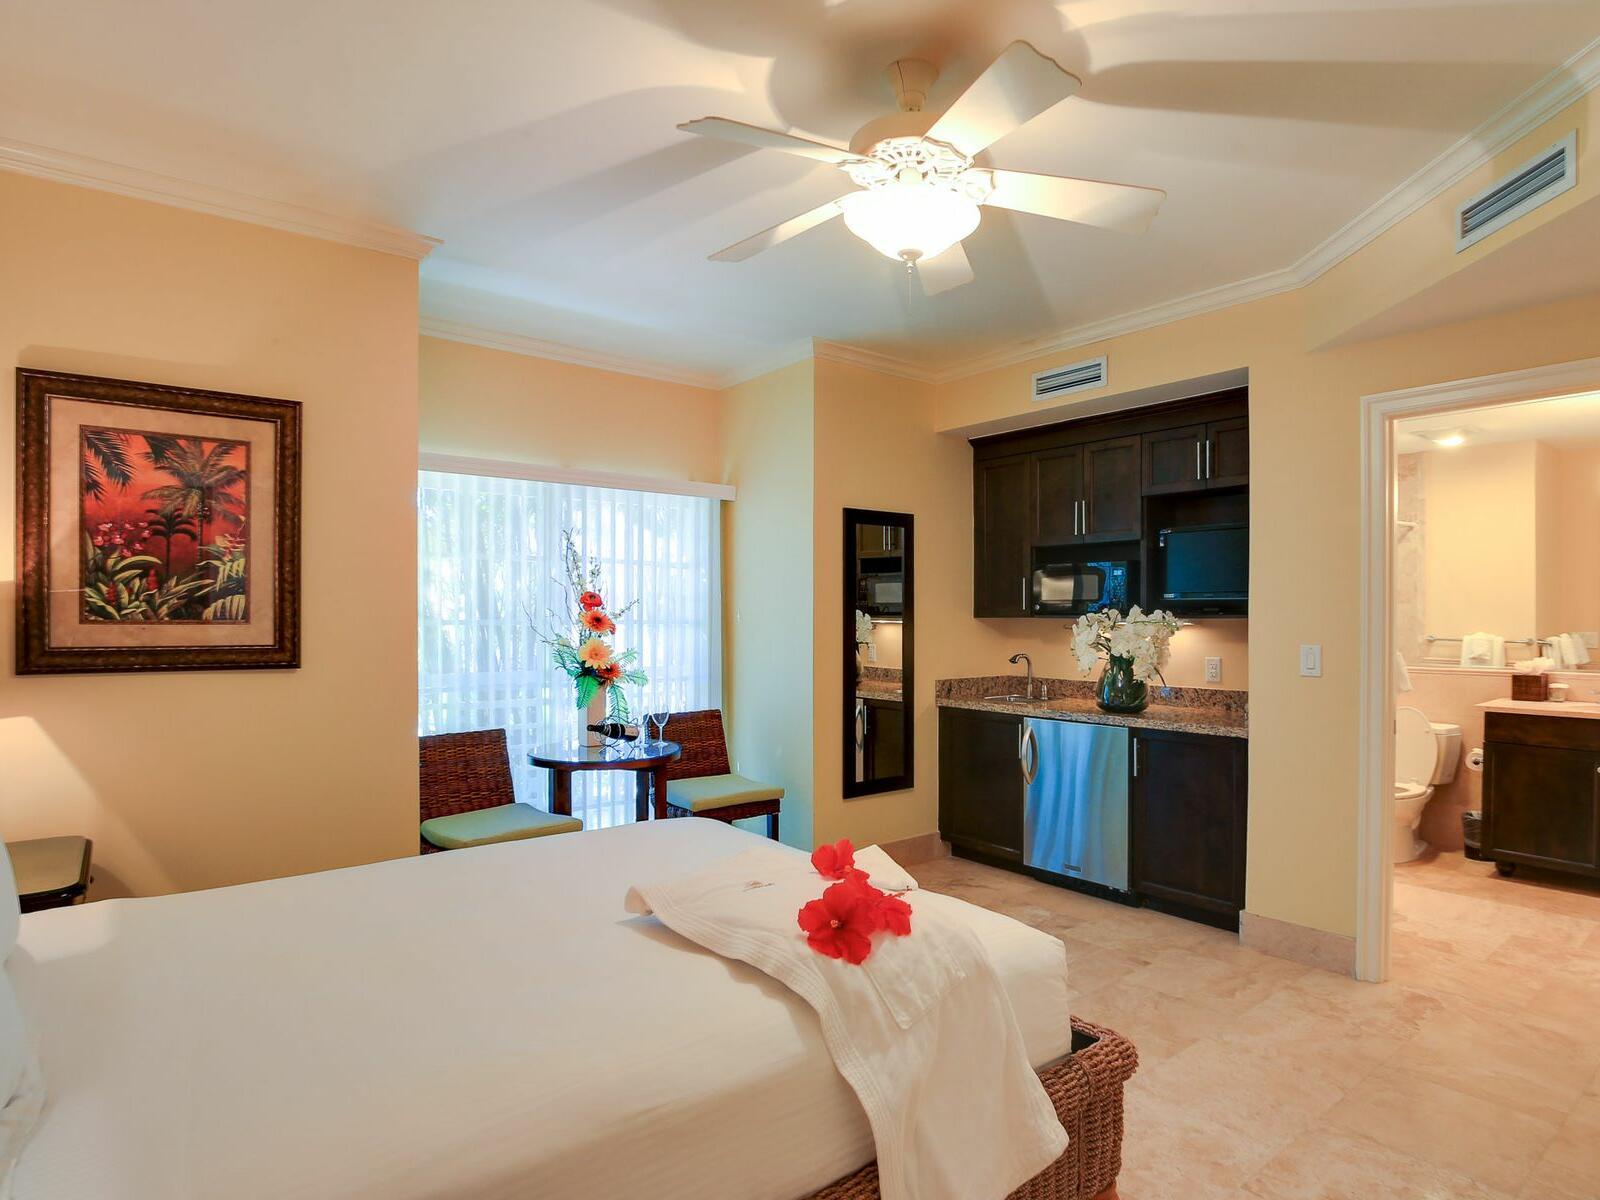 Bedroom of Studio at Windsong Resort On The Reef